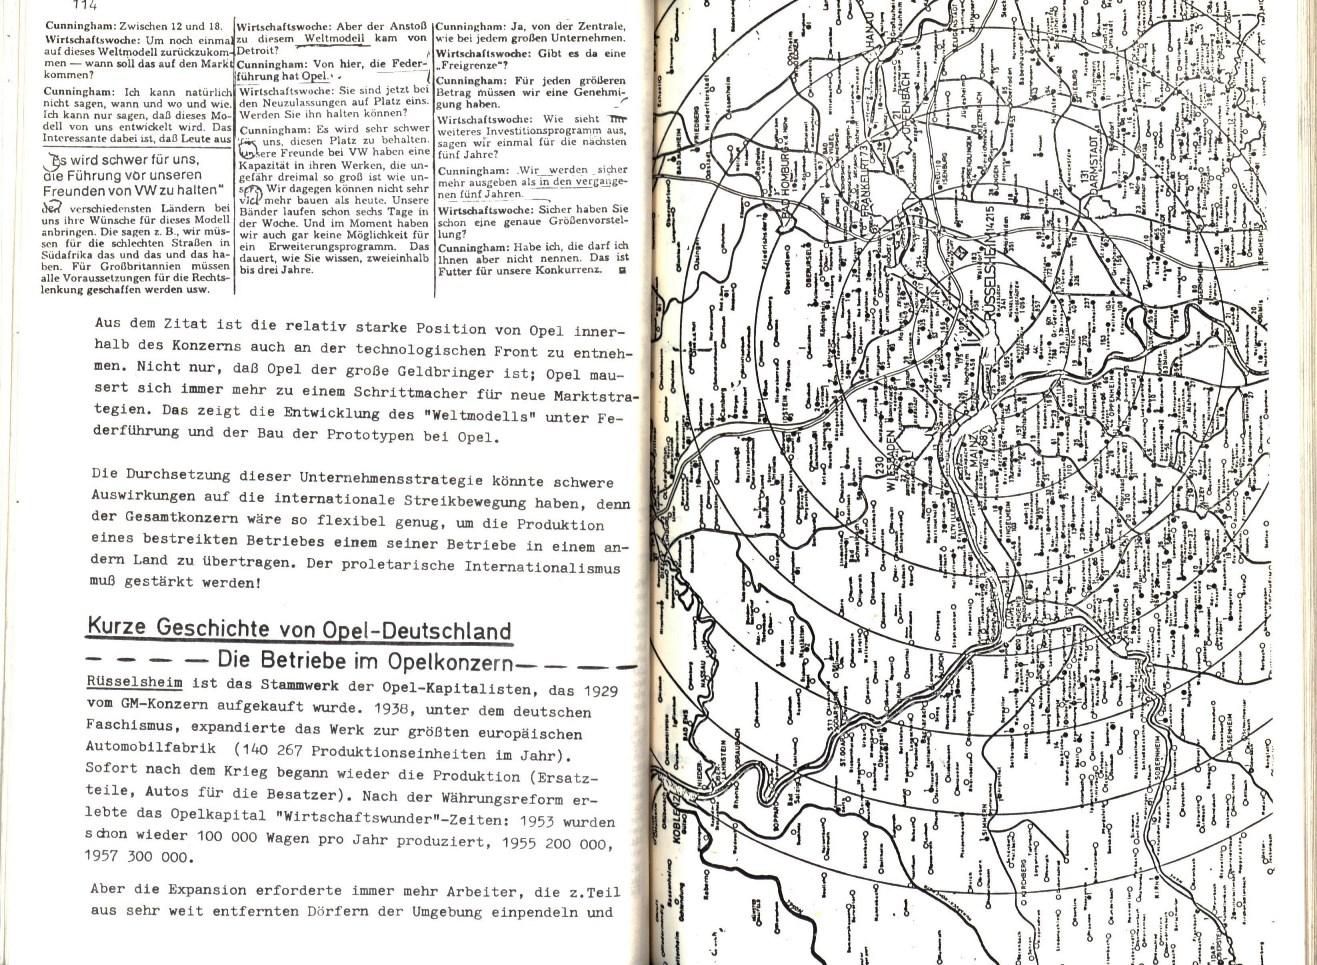 Bochum_IGM_Opel_PG_Opel_streikt_1973_059